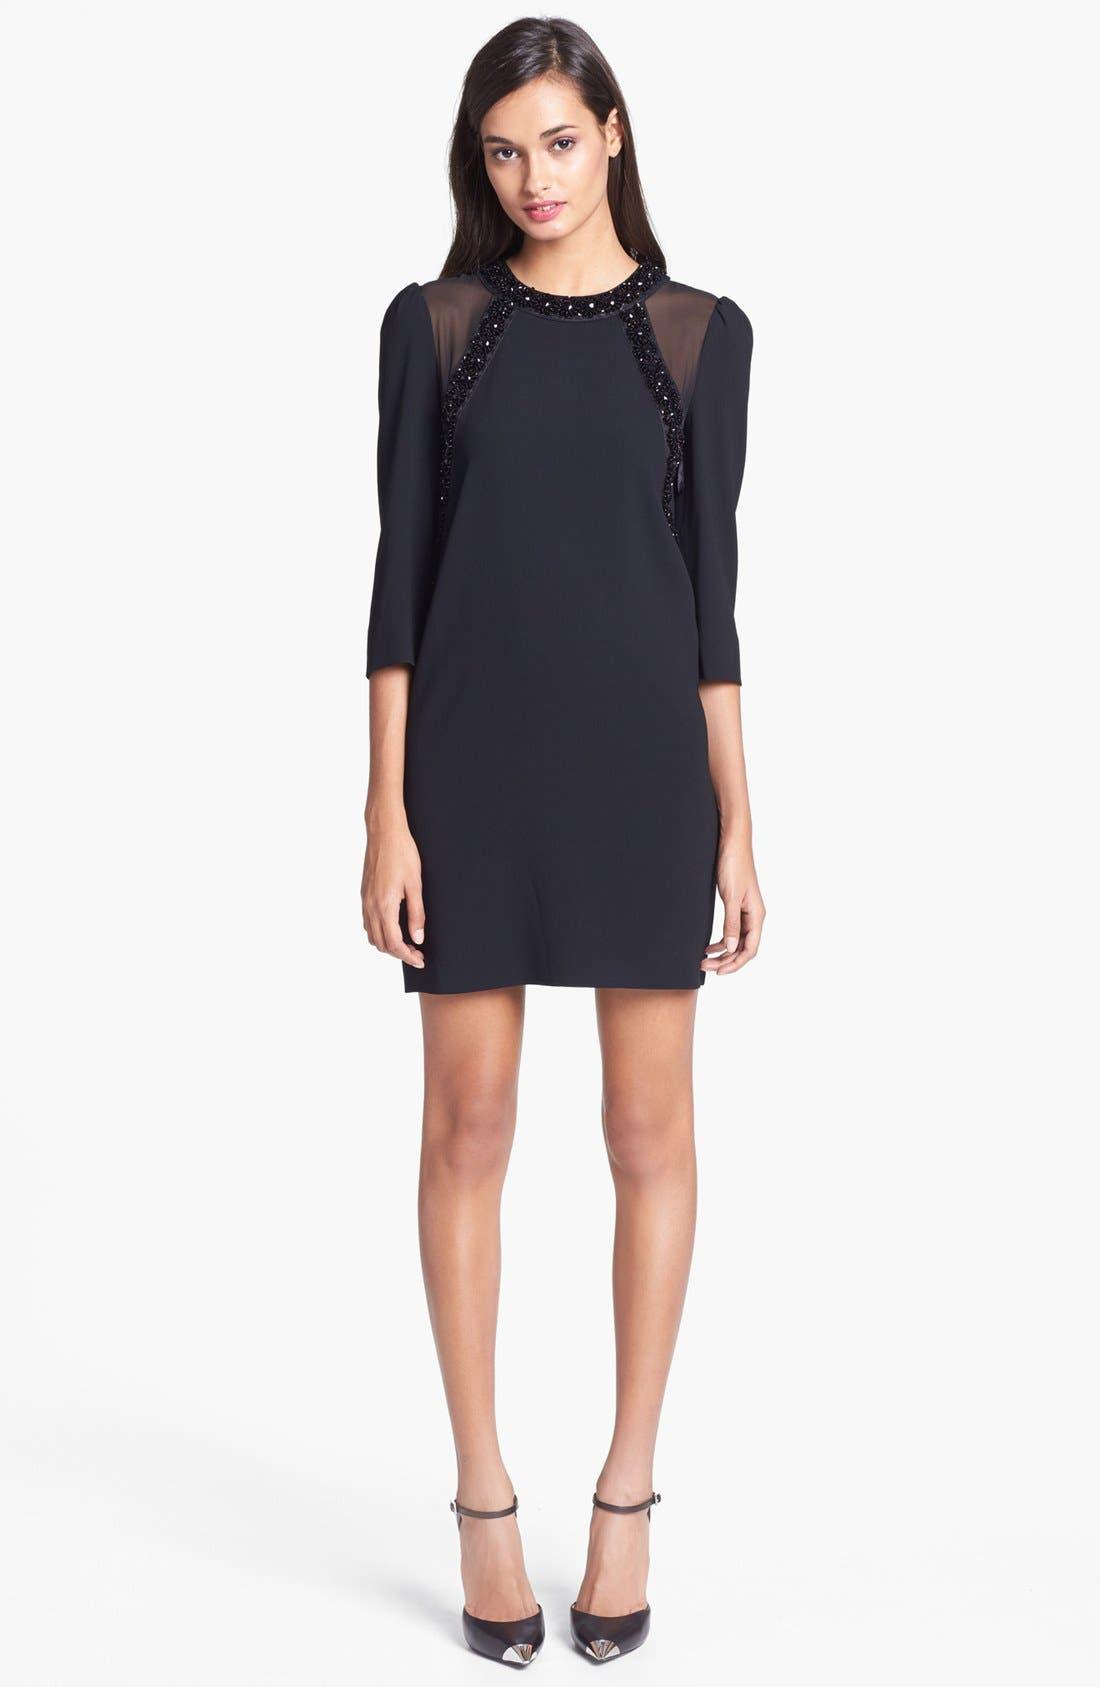 Main Image - MARC BY MARC JACOBS 'Kisa' Embellished Silk Shift Dress